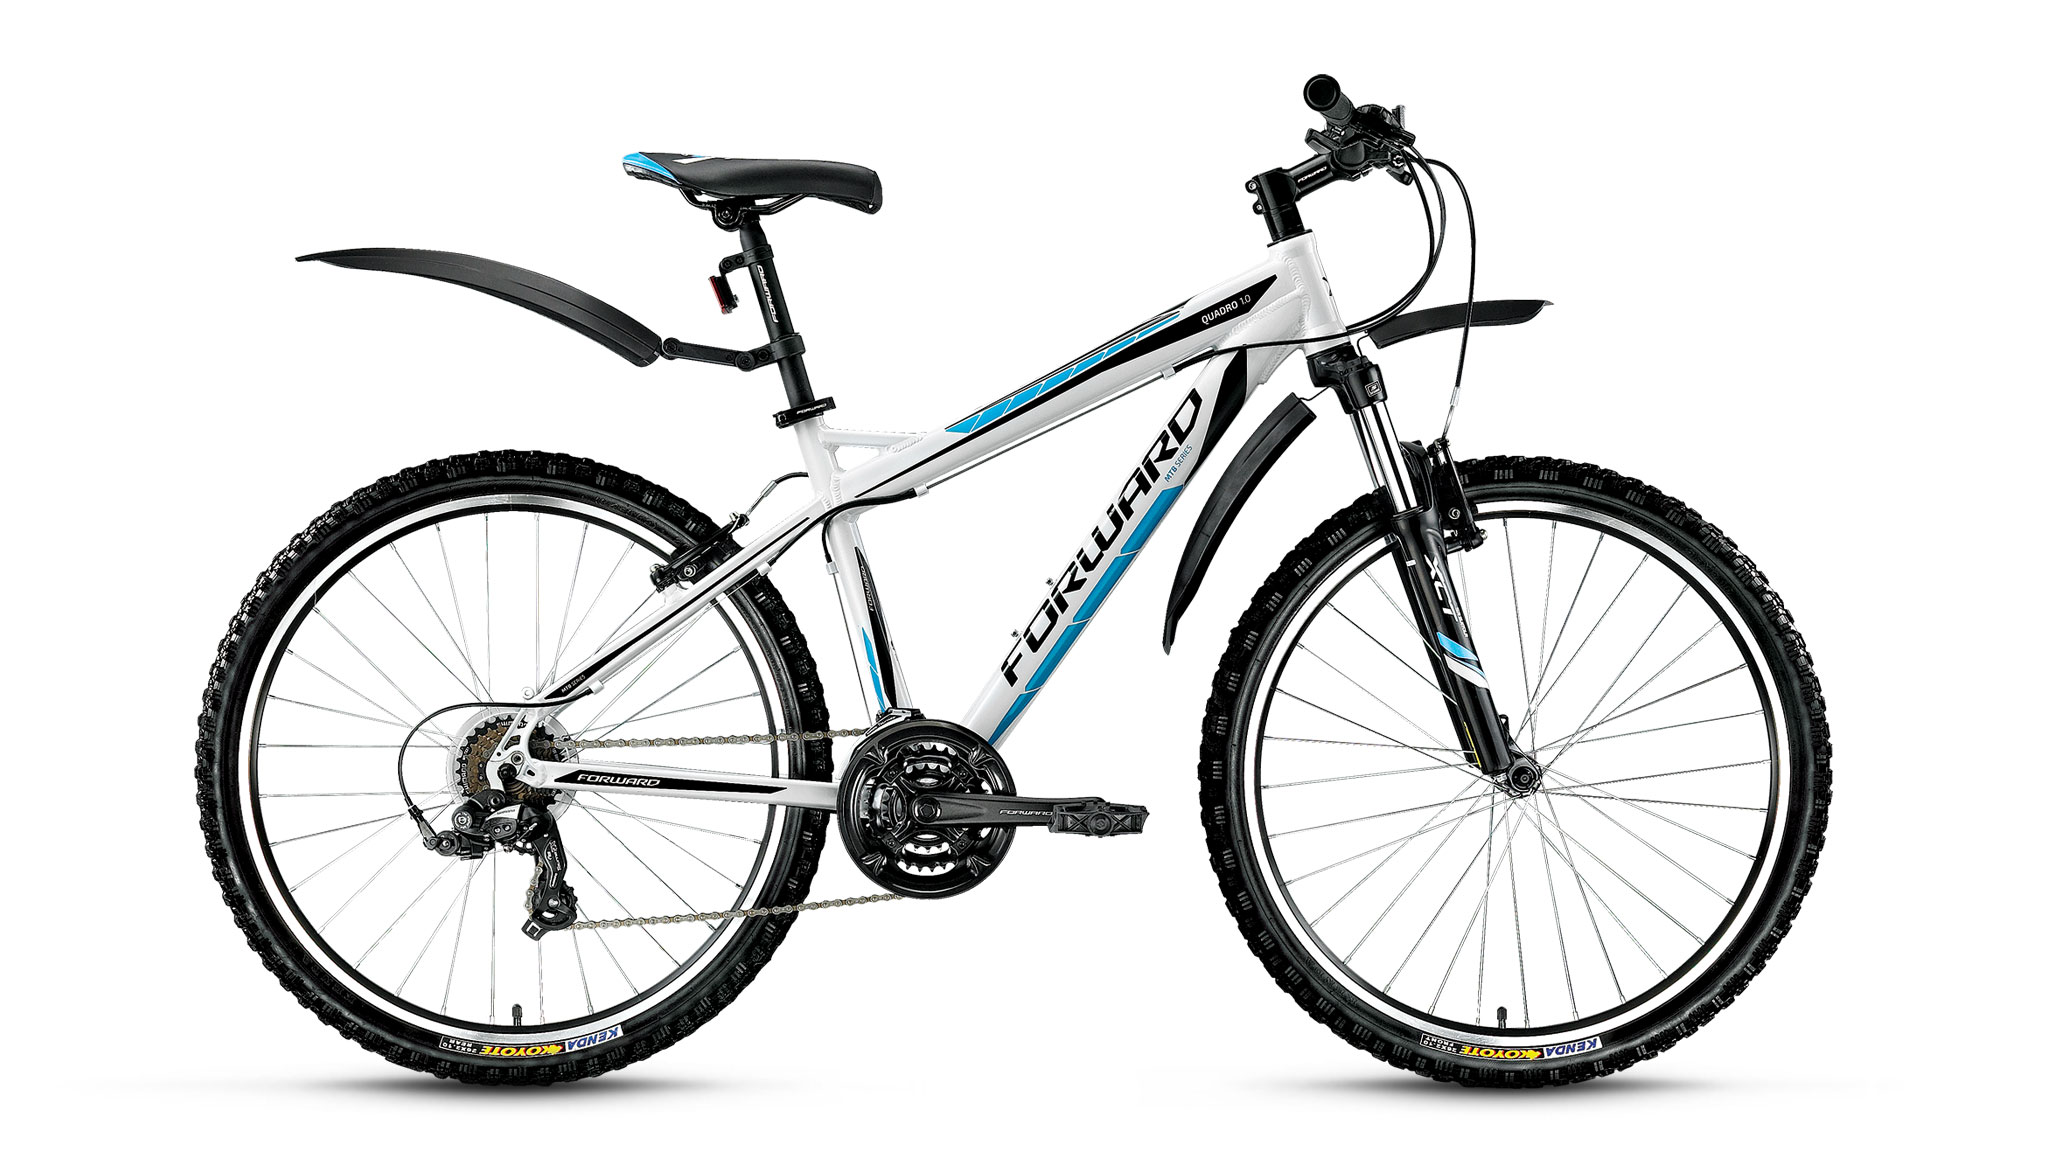 FORWARD Велосипед Forward Quadro 1.0 (2016) белый 19 велосипед forward portsmouth 1 0 19 2016 black